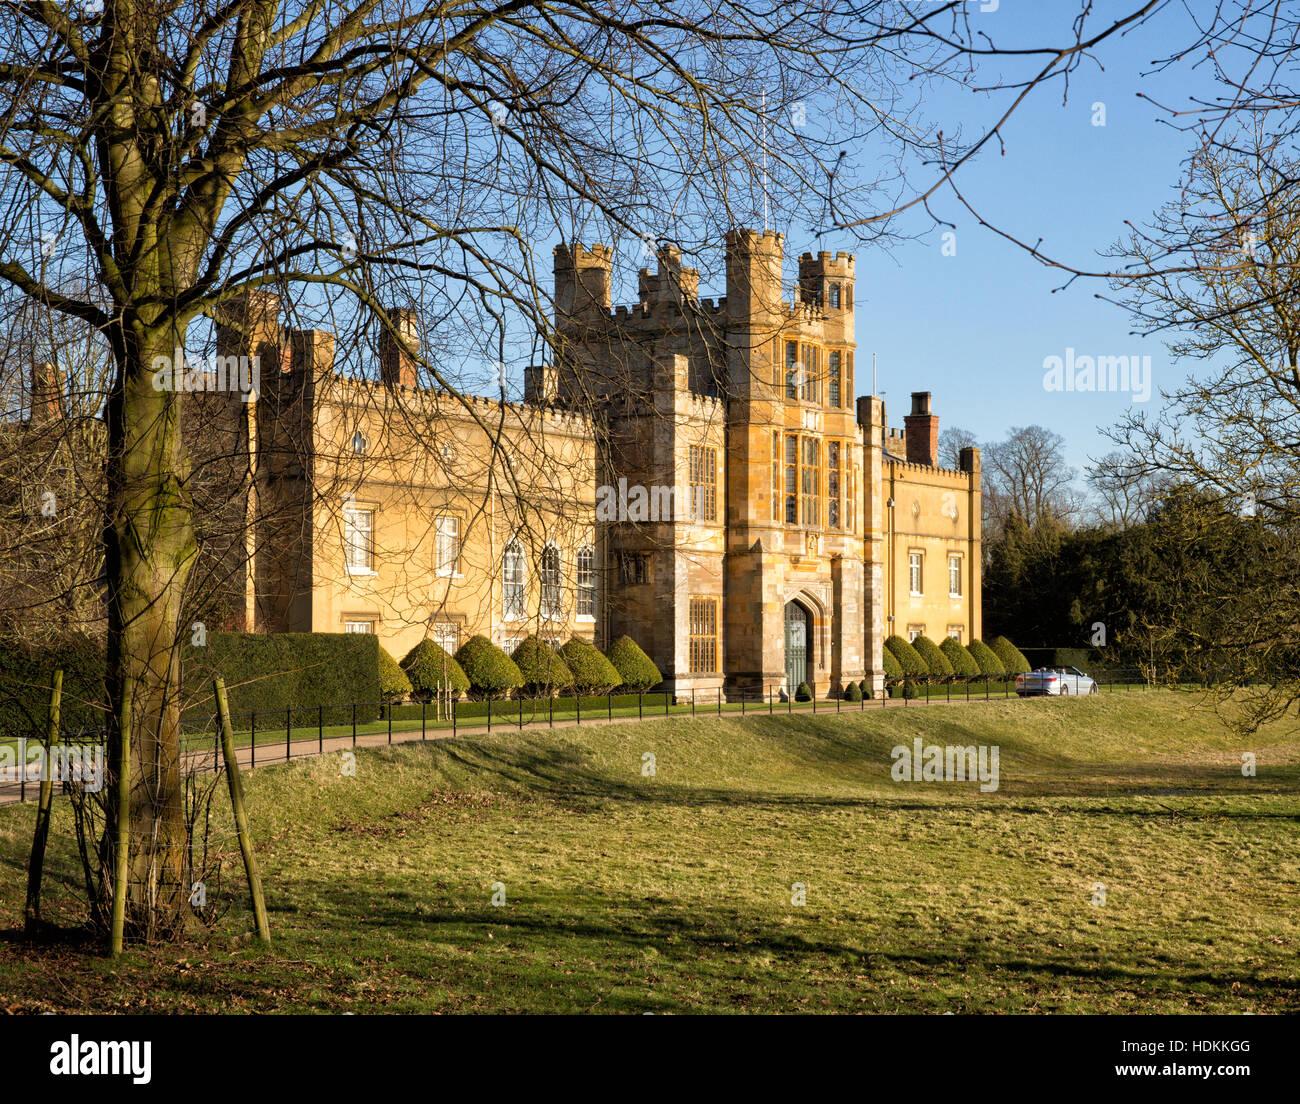 Coughton Court - Tudor home of the Throckmorton family in Warwickshire UK - Stock Image